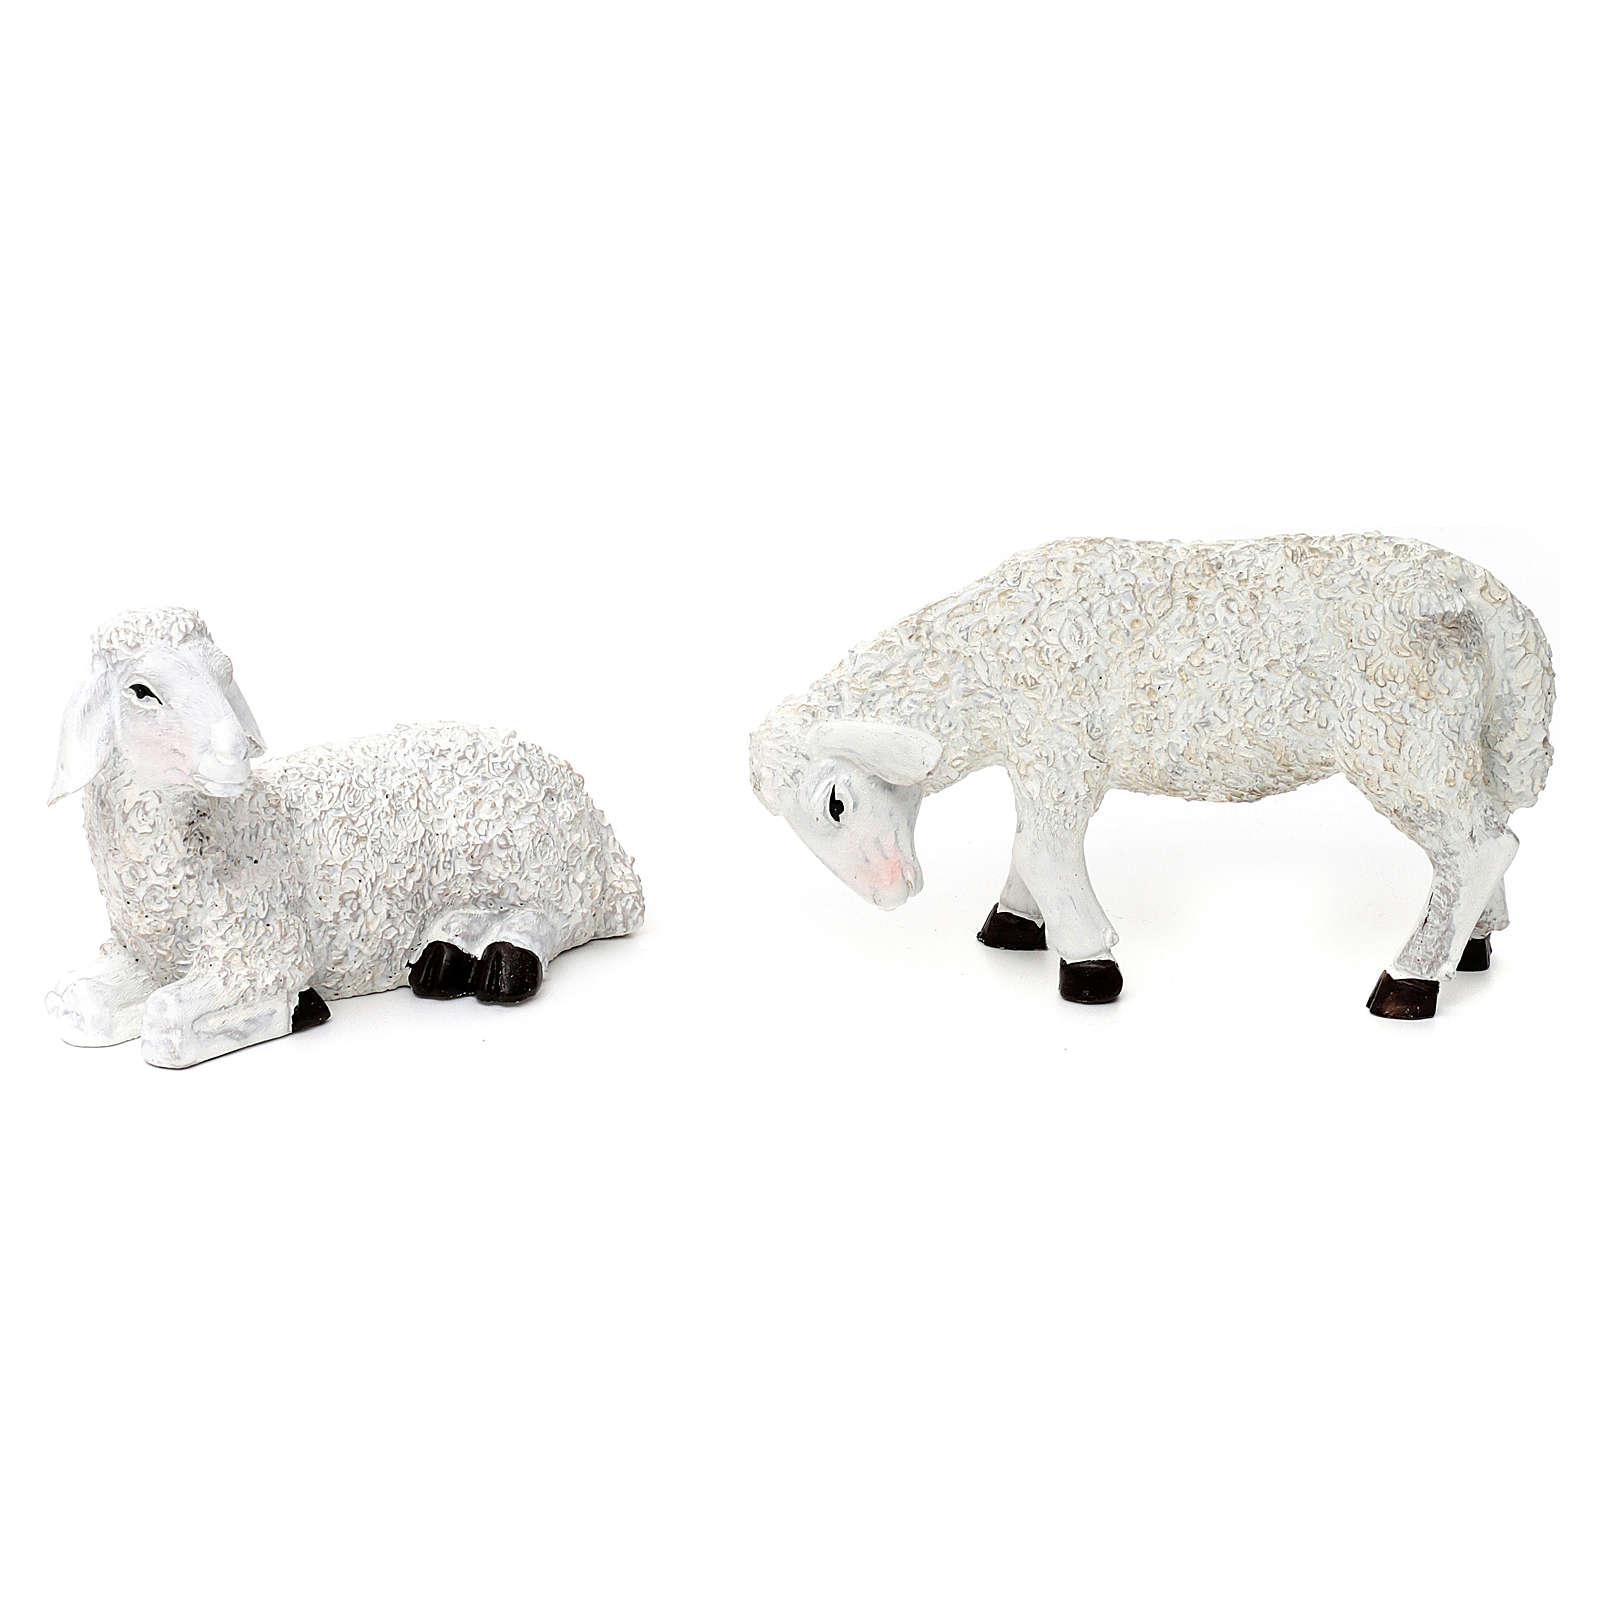 Set 5 Pecore e ariete resina colorata per presepe 25-30 cm 3